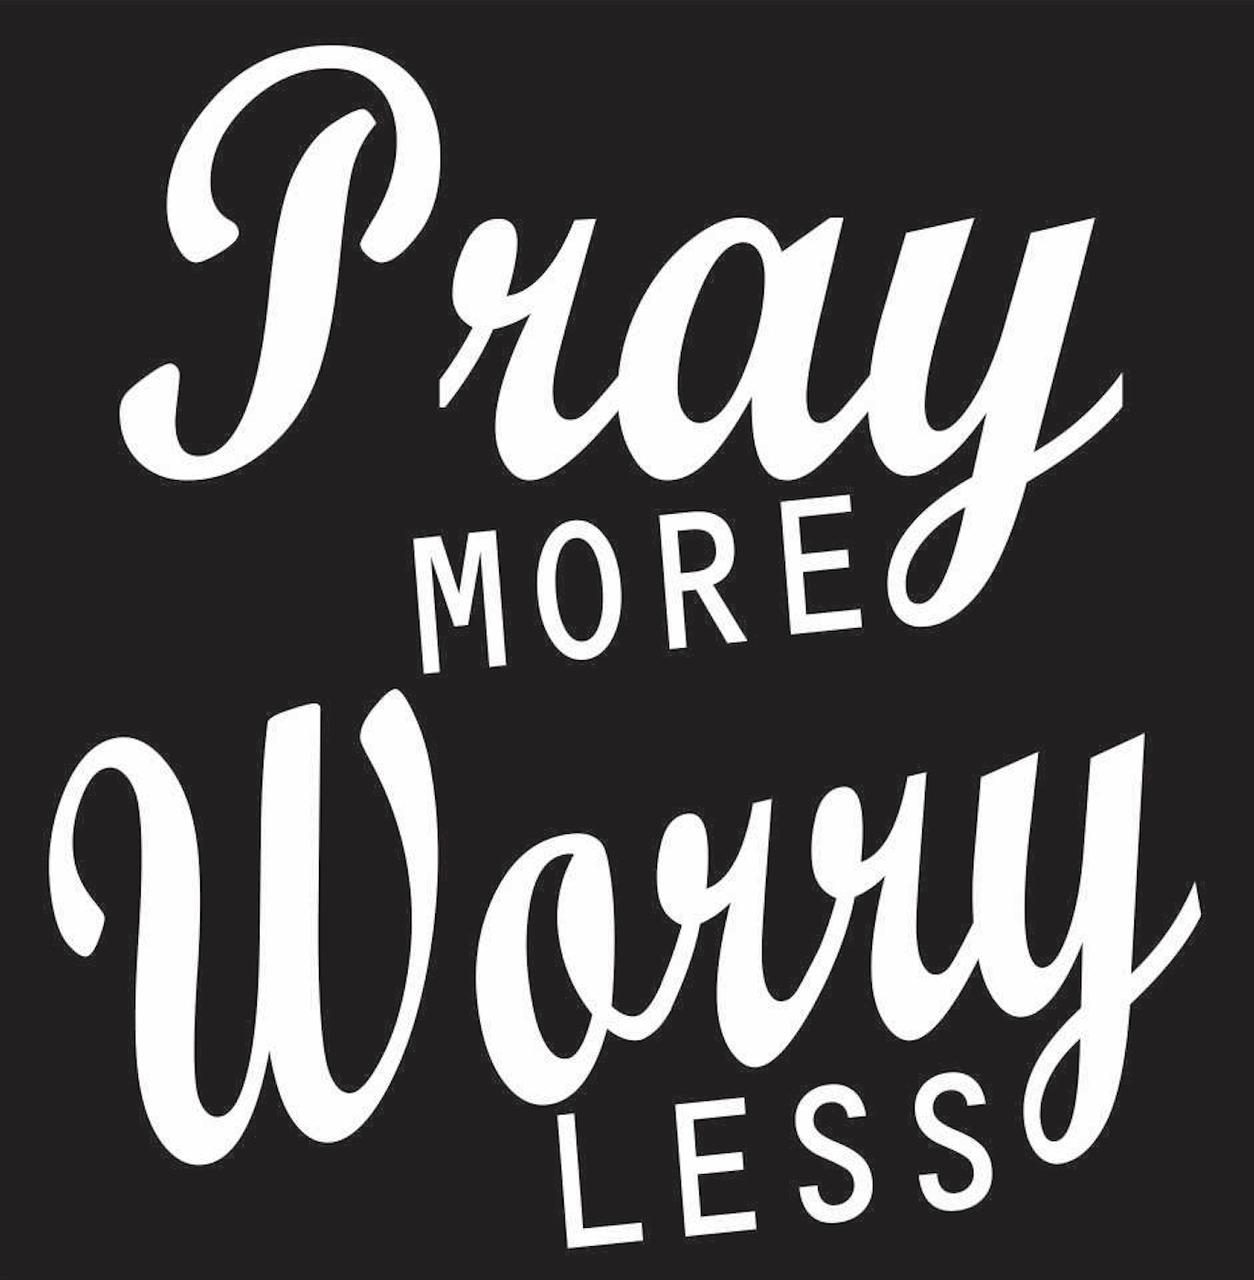 Pray More Worry Less Vinyl Transfer (White) - Texas Rhinestone 598189673b4d